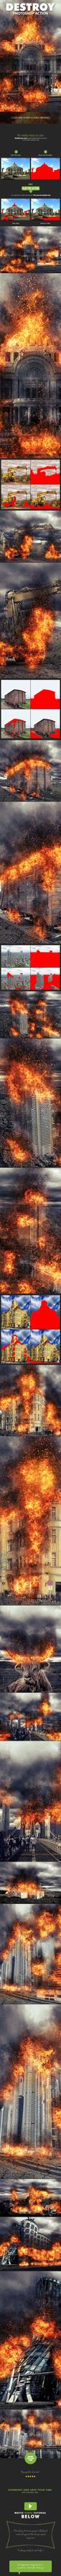 3 Photoshop Actions Bundle - Vol.4 by Kluzya